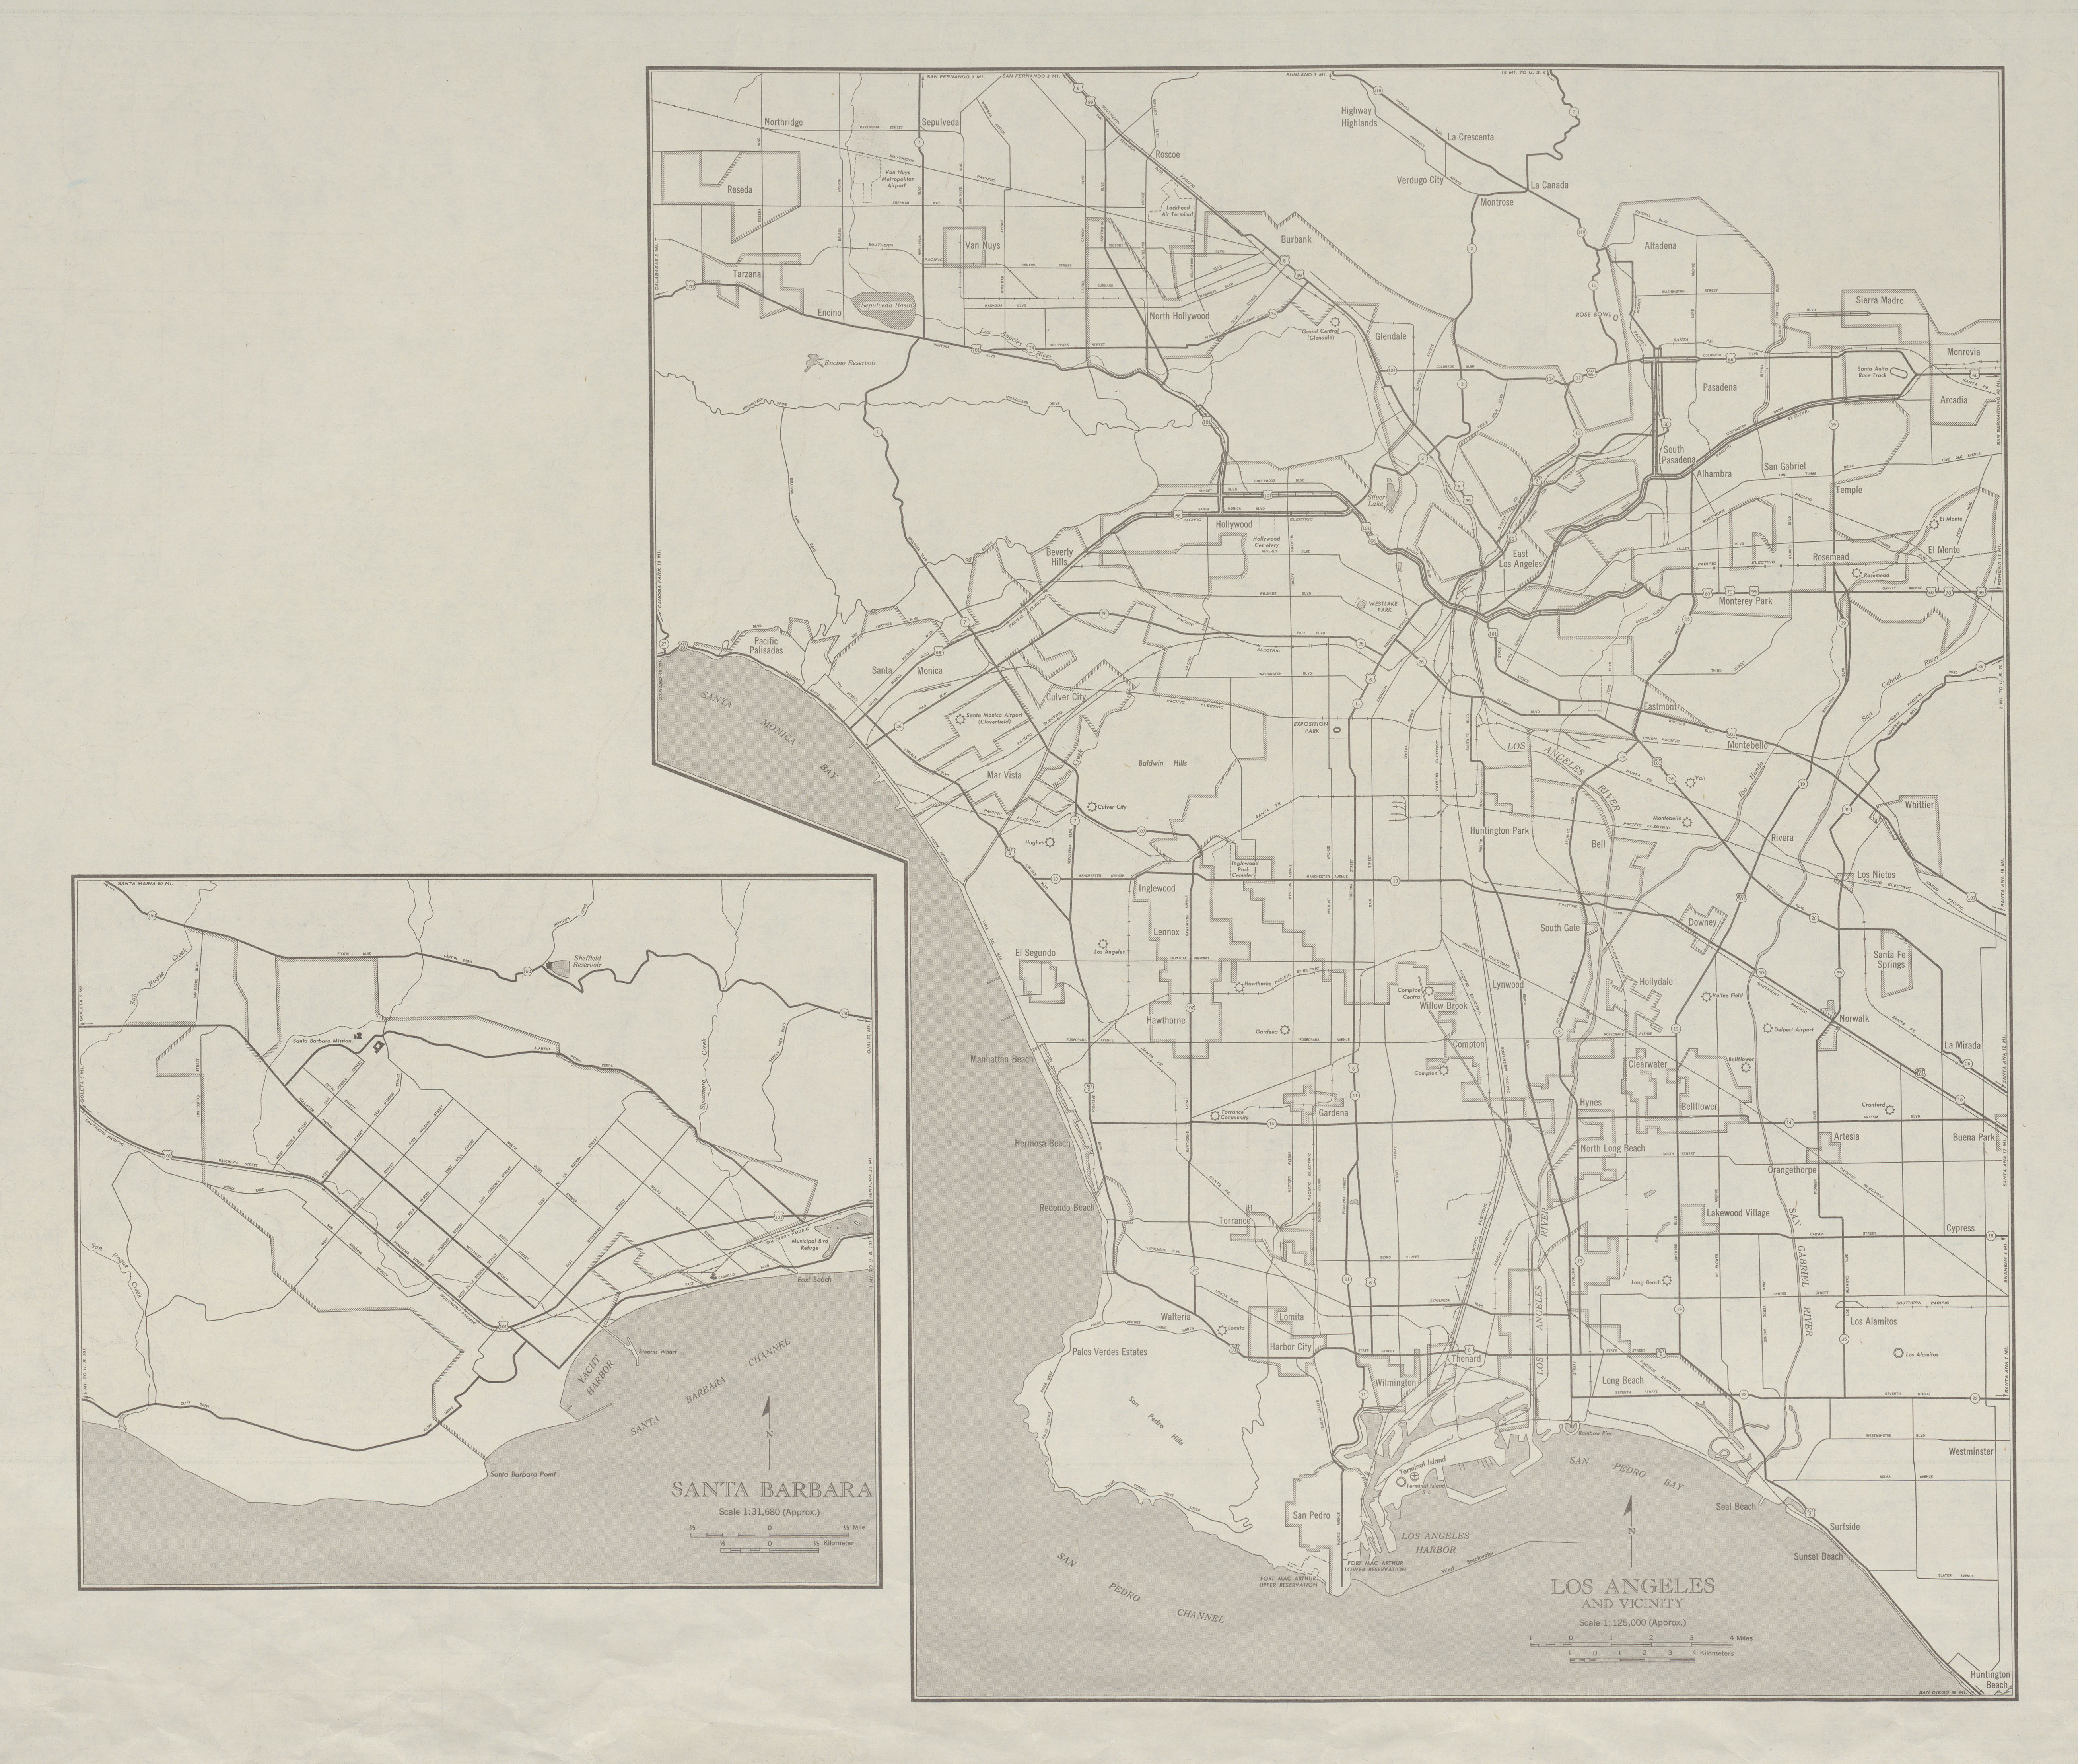 City Maps of Los Angeles, Santa Barbara and Vicinity, California, United States 1947